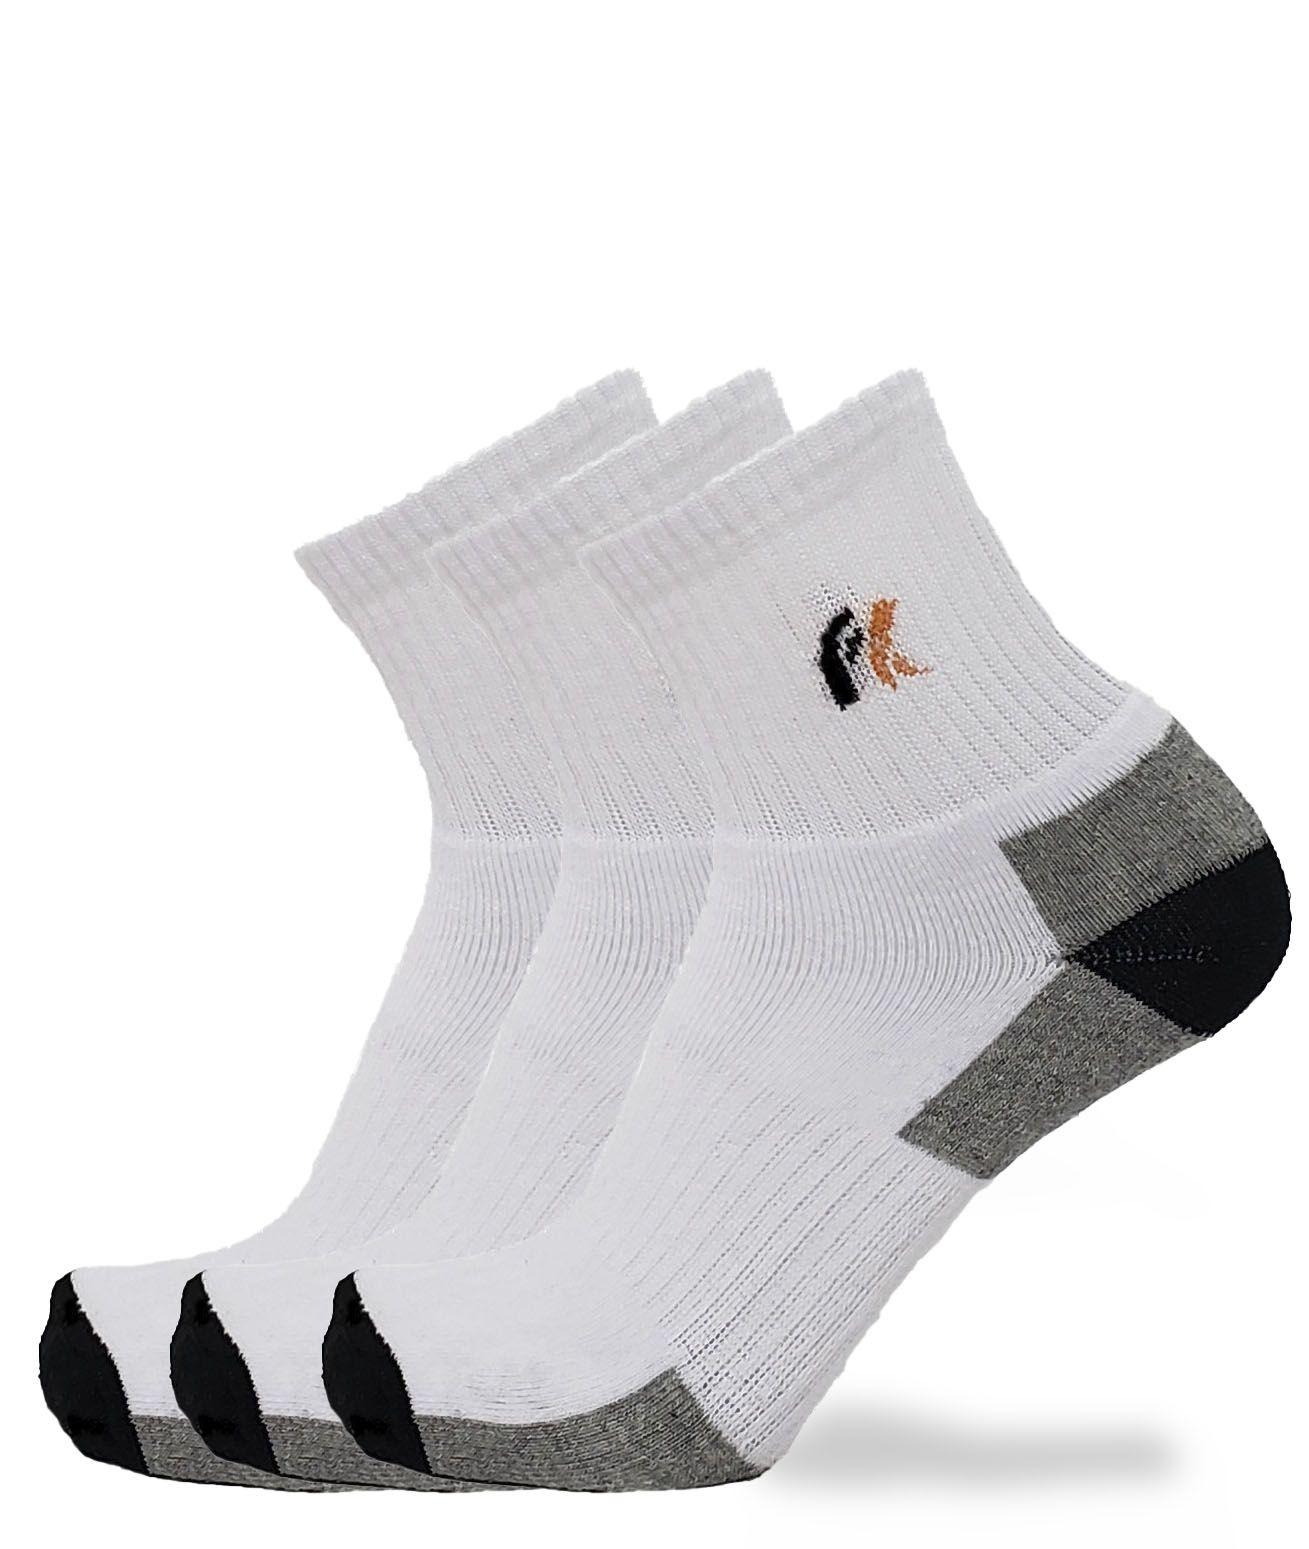 KIT COM 3 MEIAS FOOTLOOK FL04LY 39/43